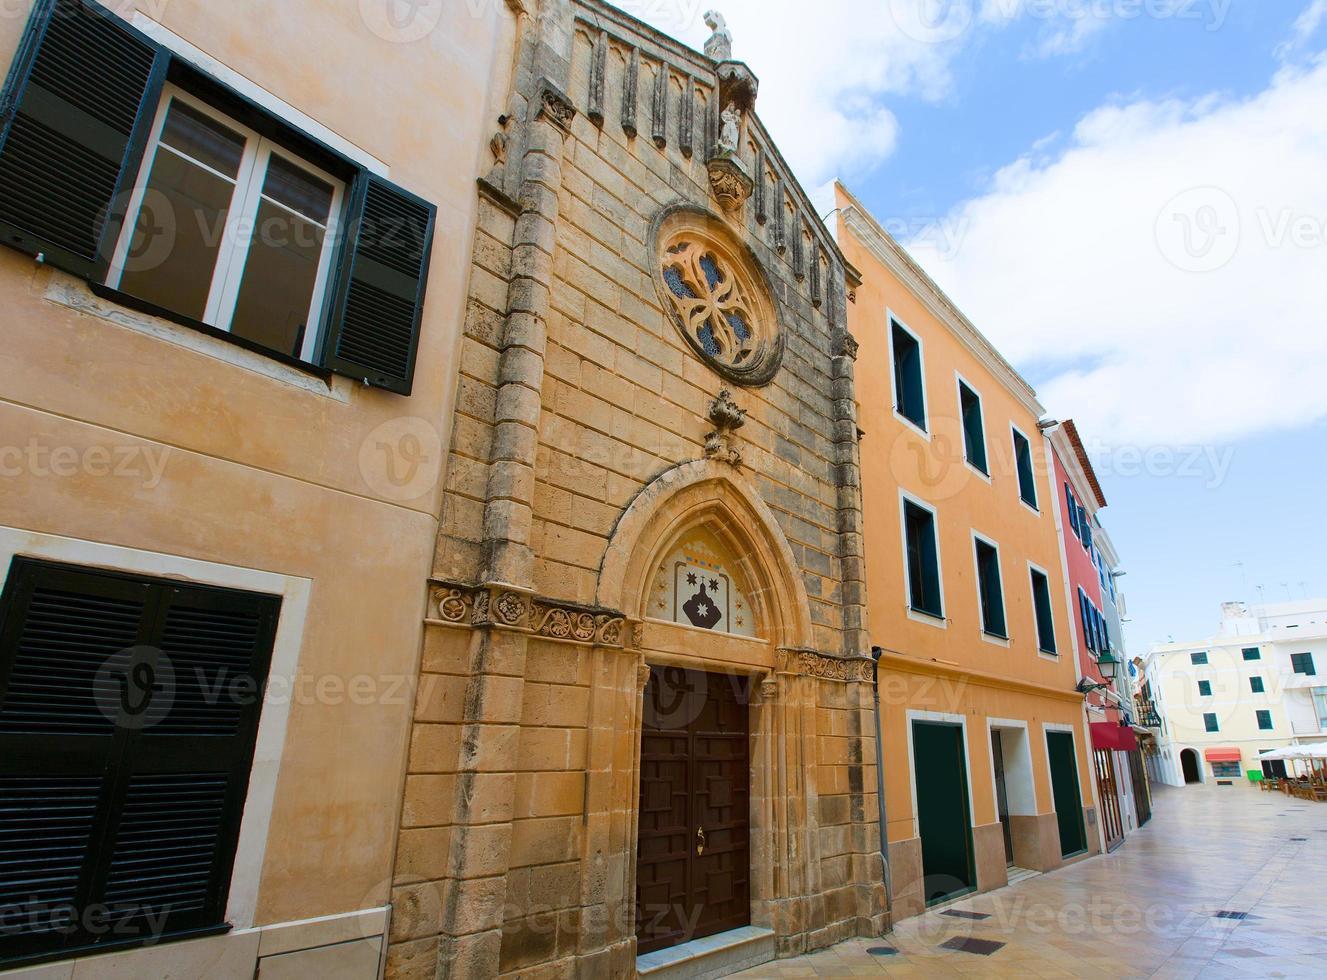 Ciutadella Menorca carrer Mao church downtown photo